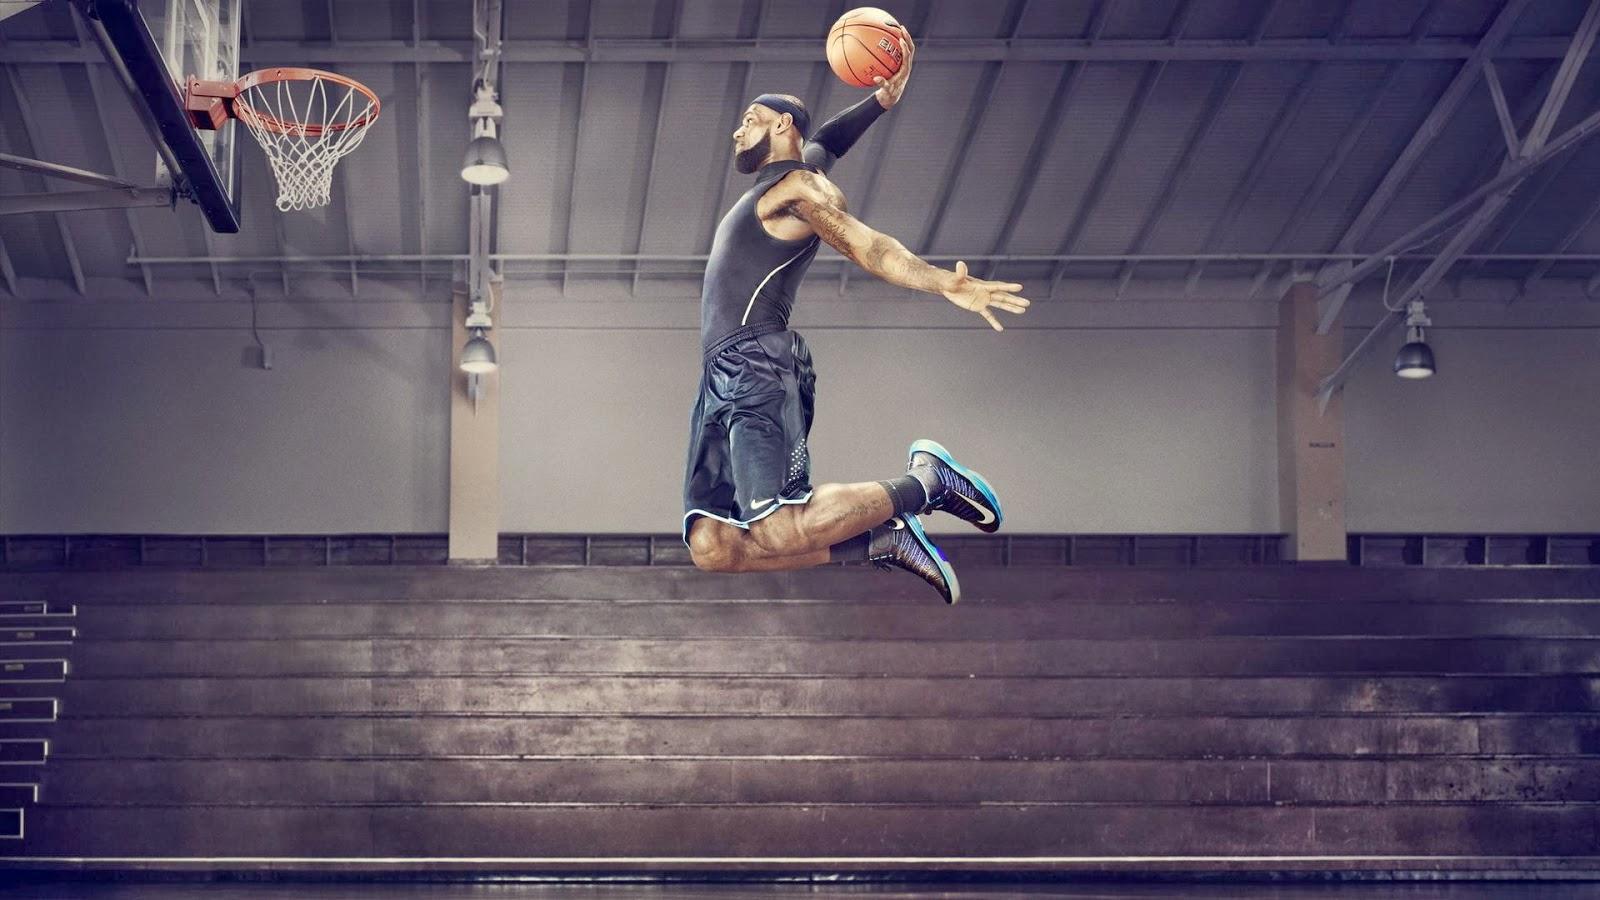 Las 3 mejores estrategias para apostar a baloncesto